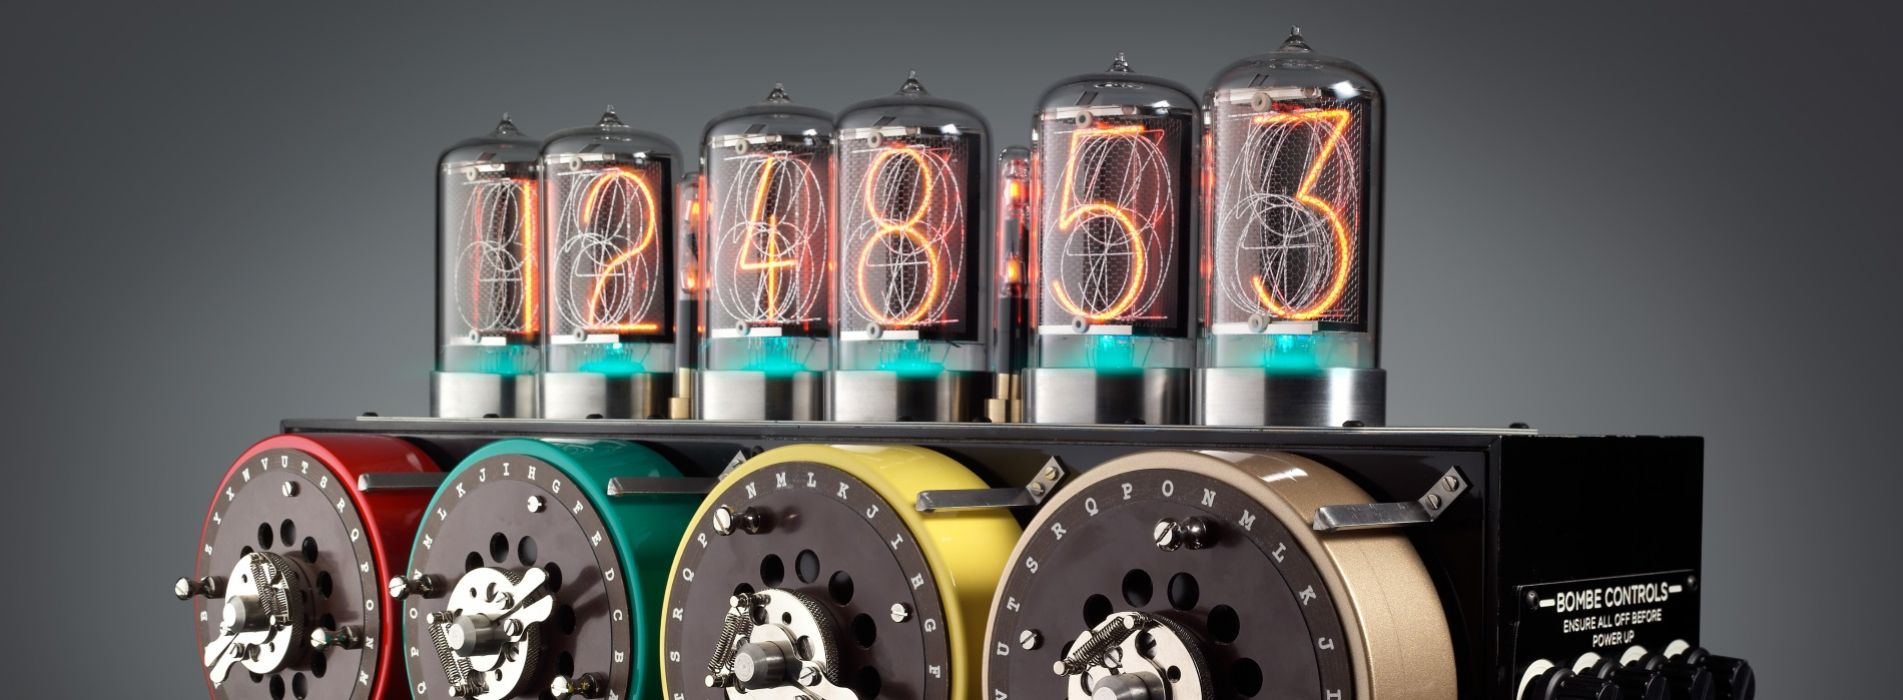 Unique And Individual Nixie Tube Clocks